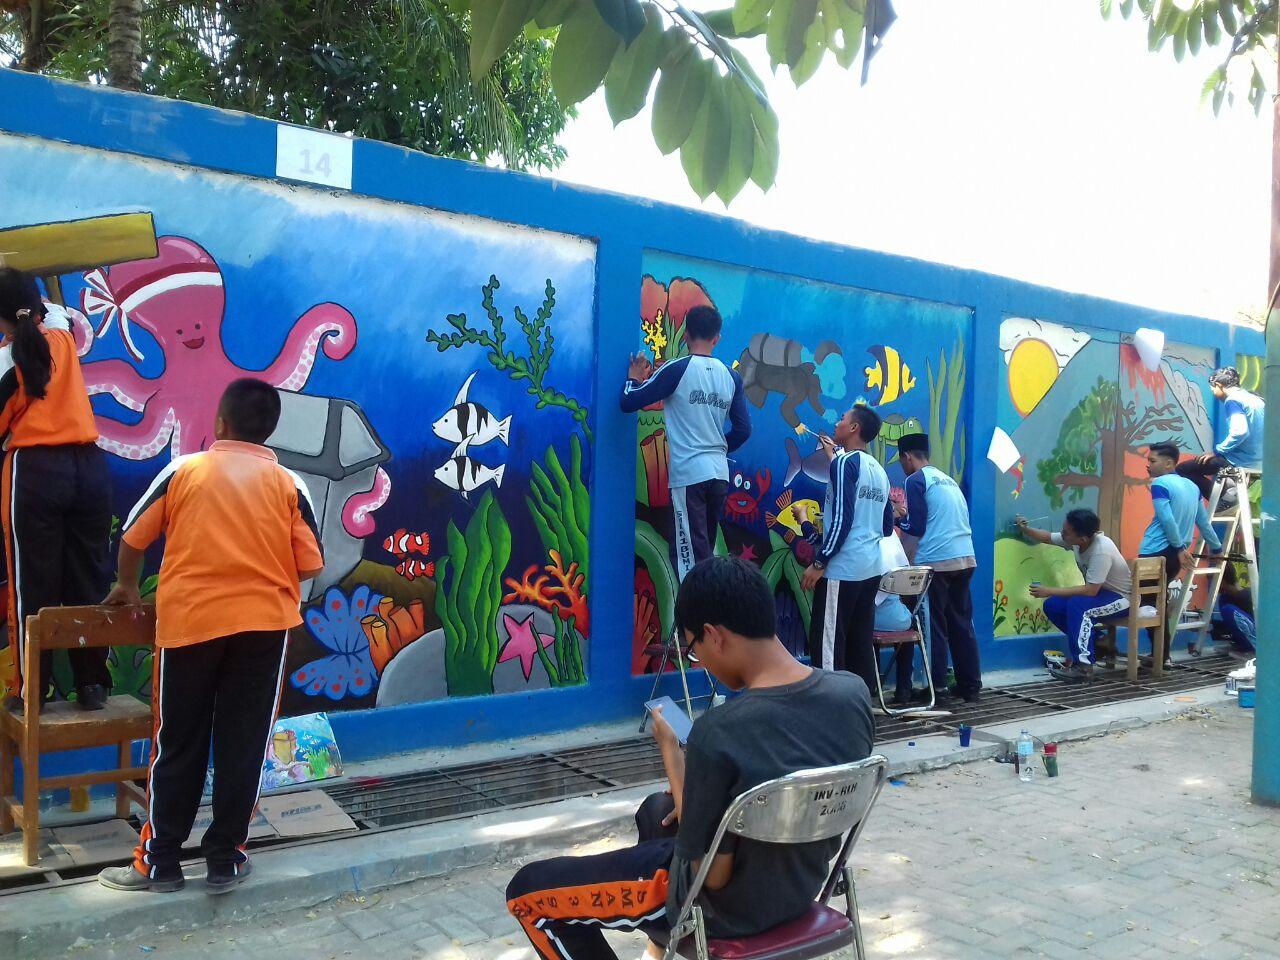 Lukisan Dinding Sekolah Menengah Cikimm Com